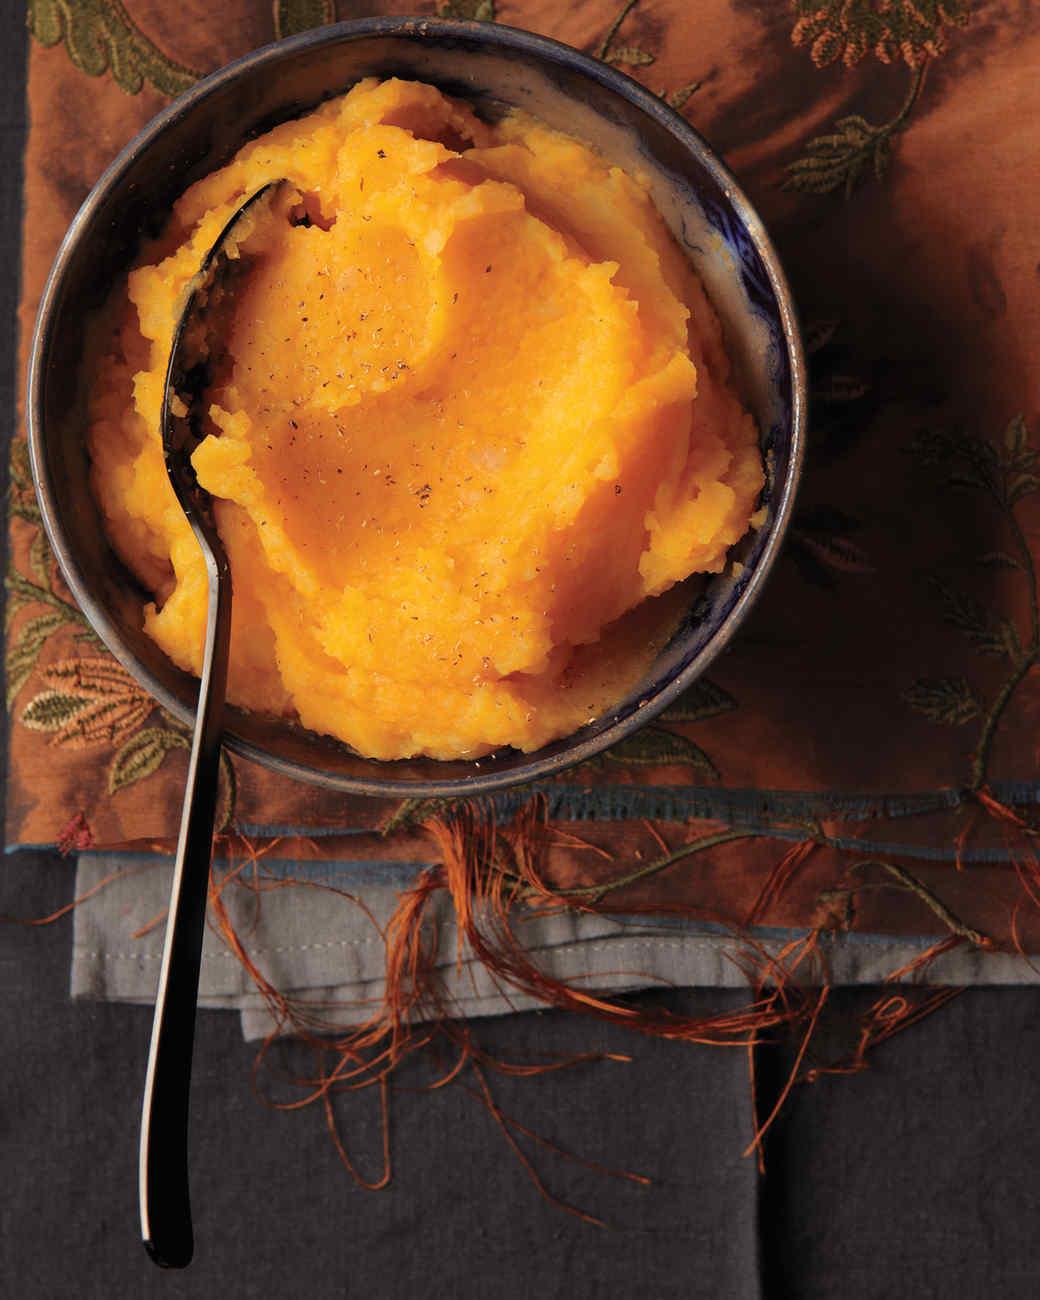 Squash-Spiked Mashed Potatoes